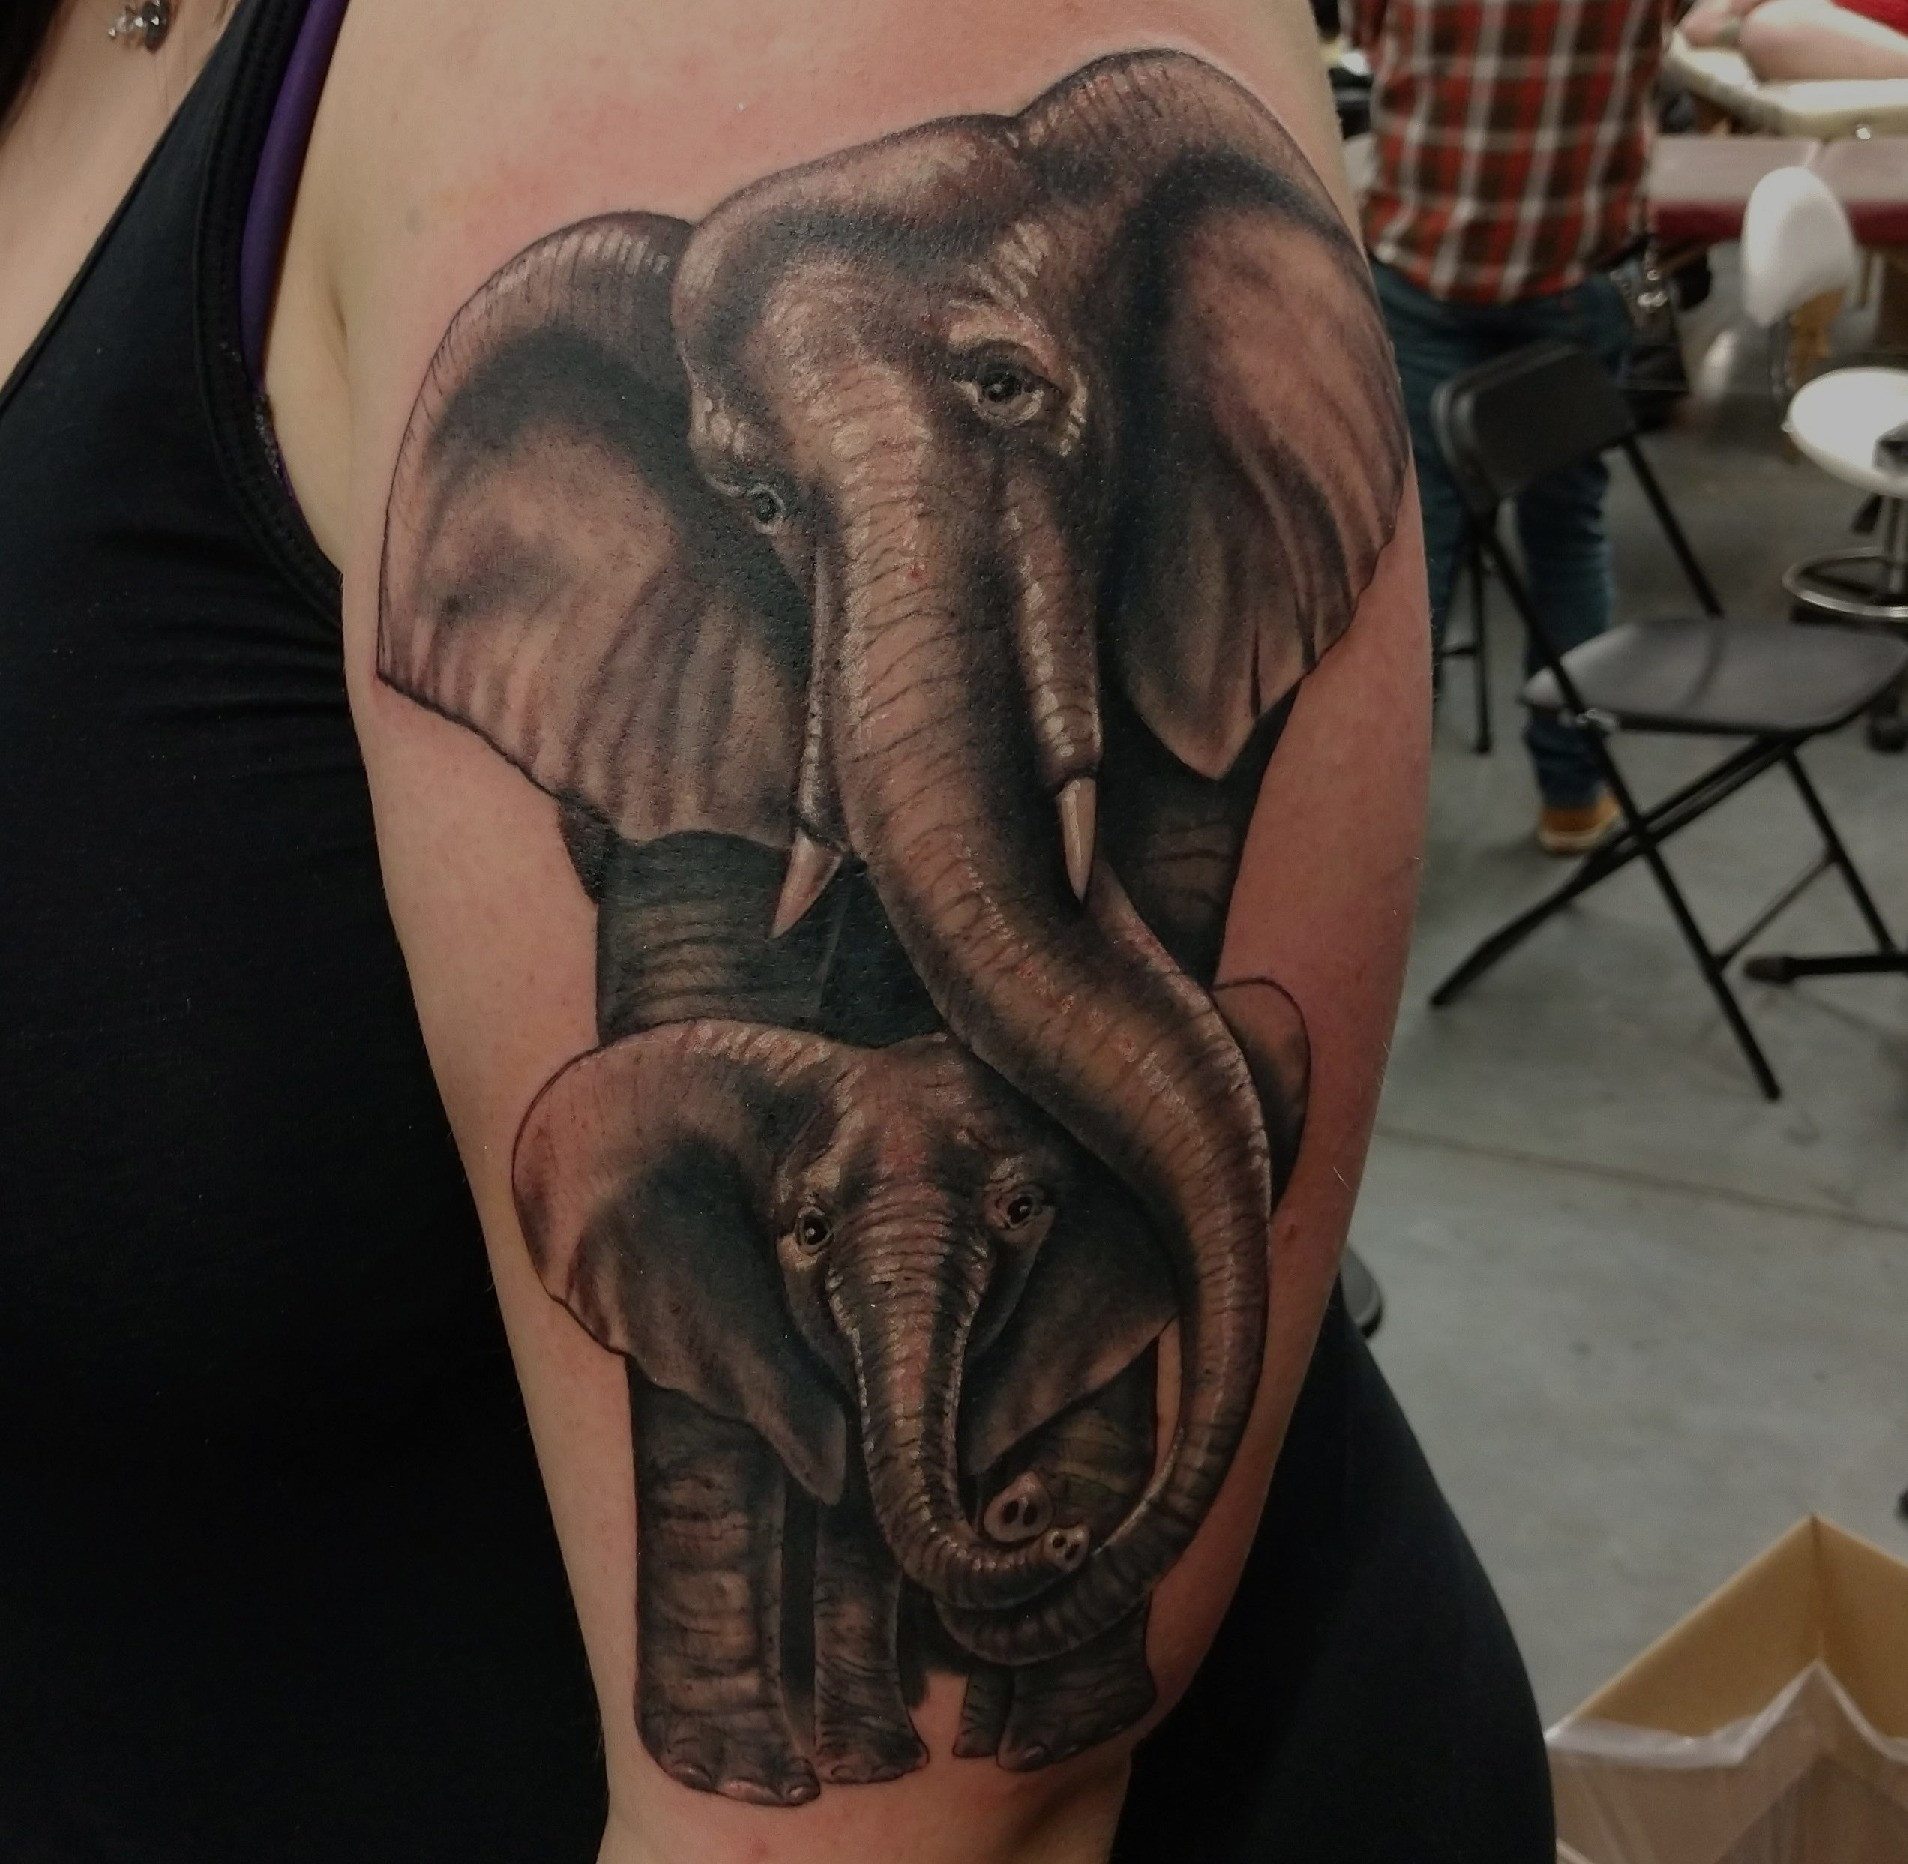 Average Tattoo Session